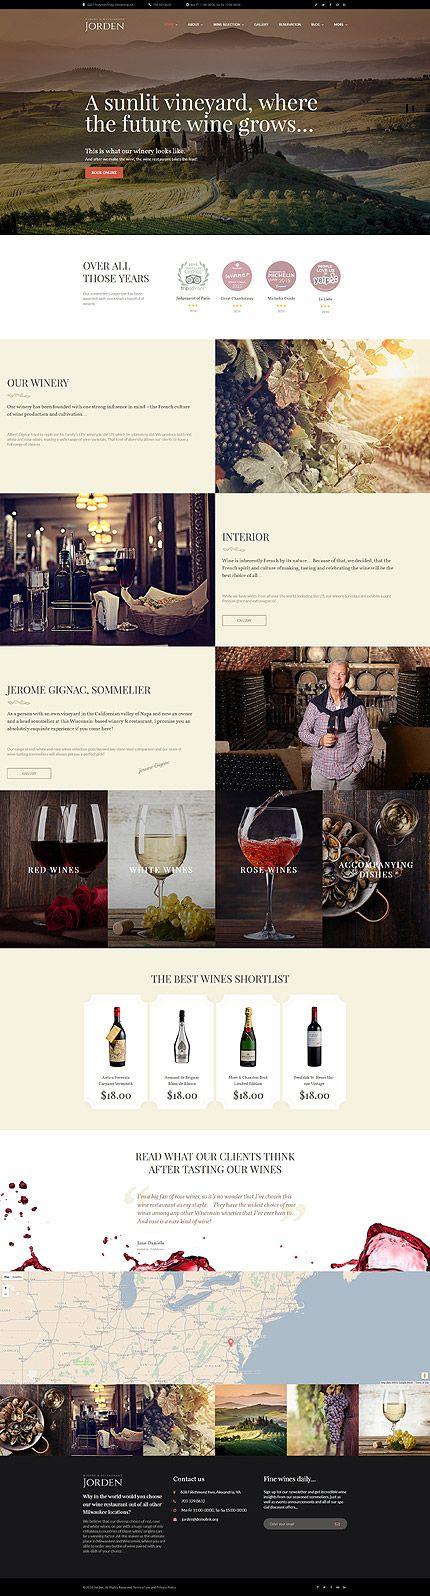 $75 - Jorden Wine Wordpress Theme | Shopify | Pinterest | Pagina web ...